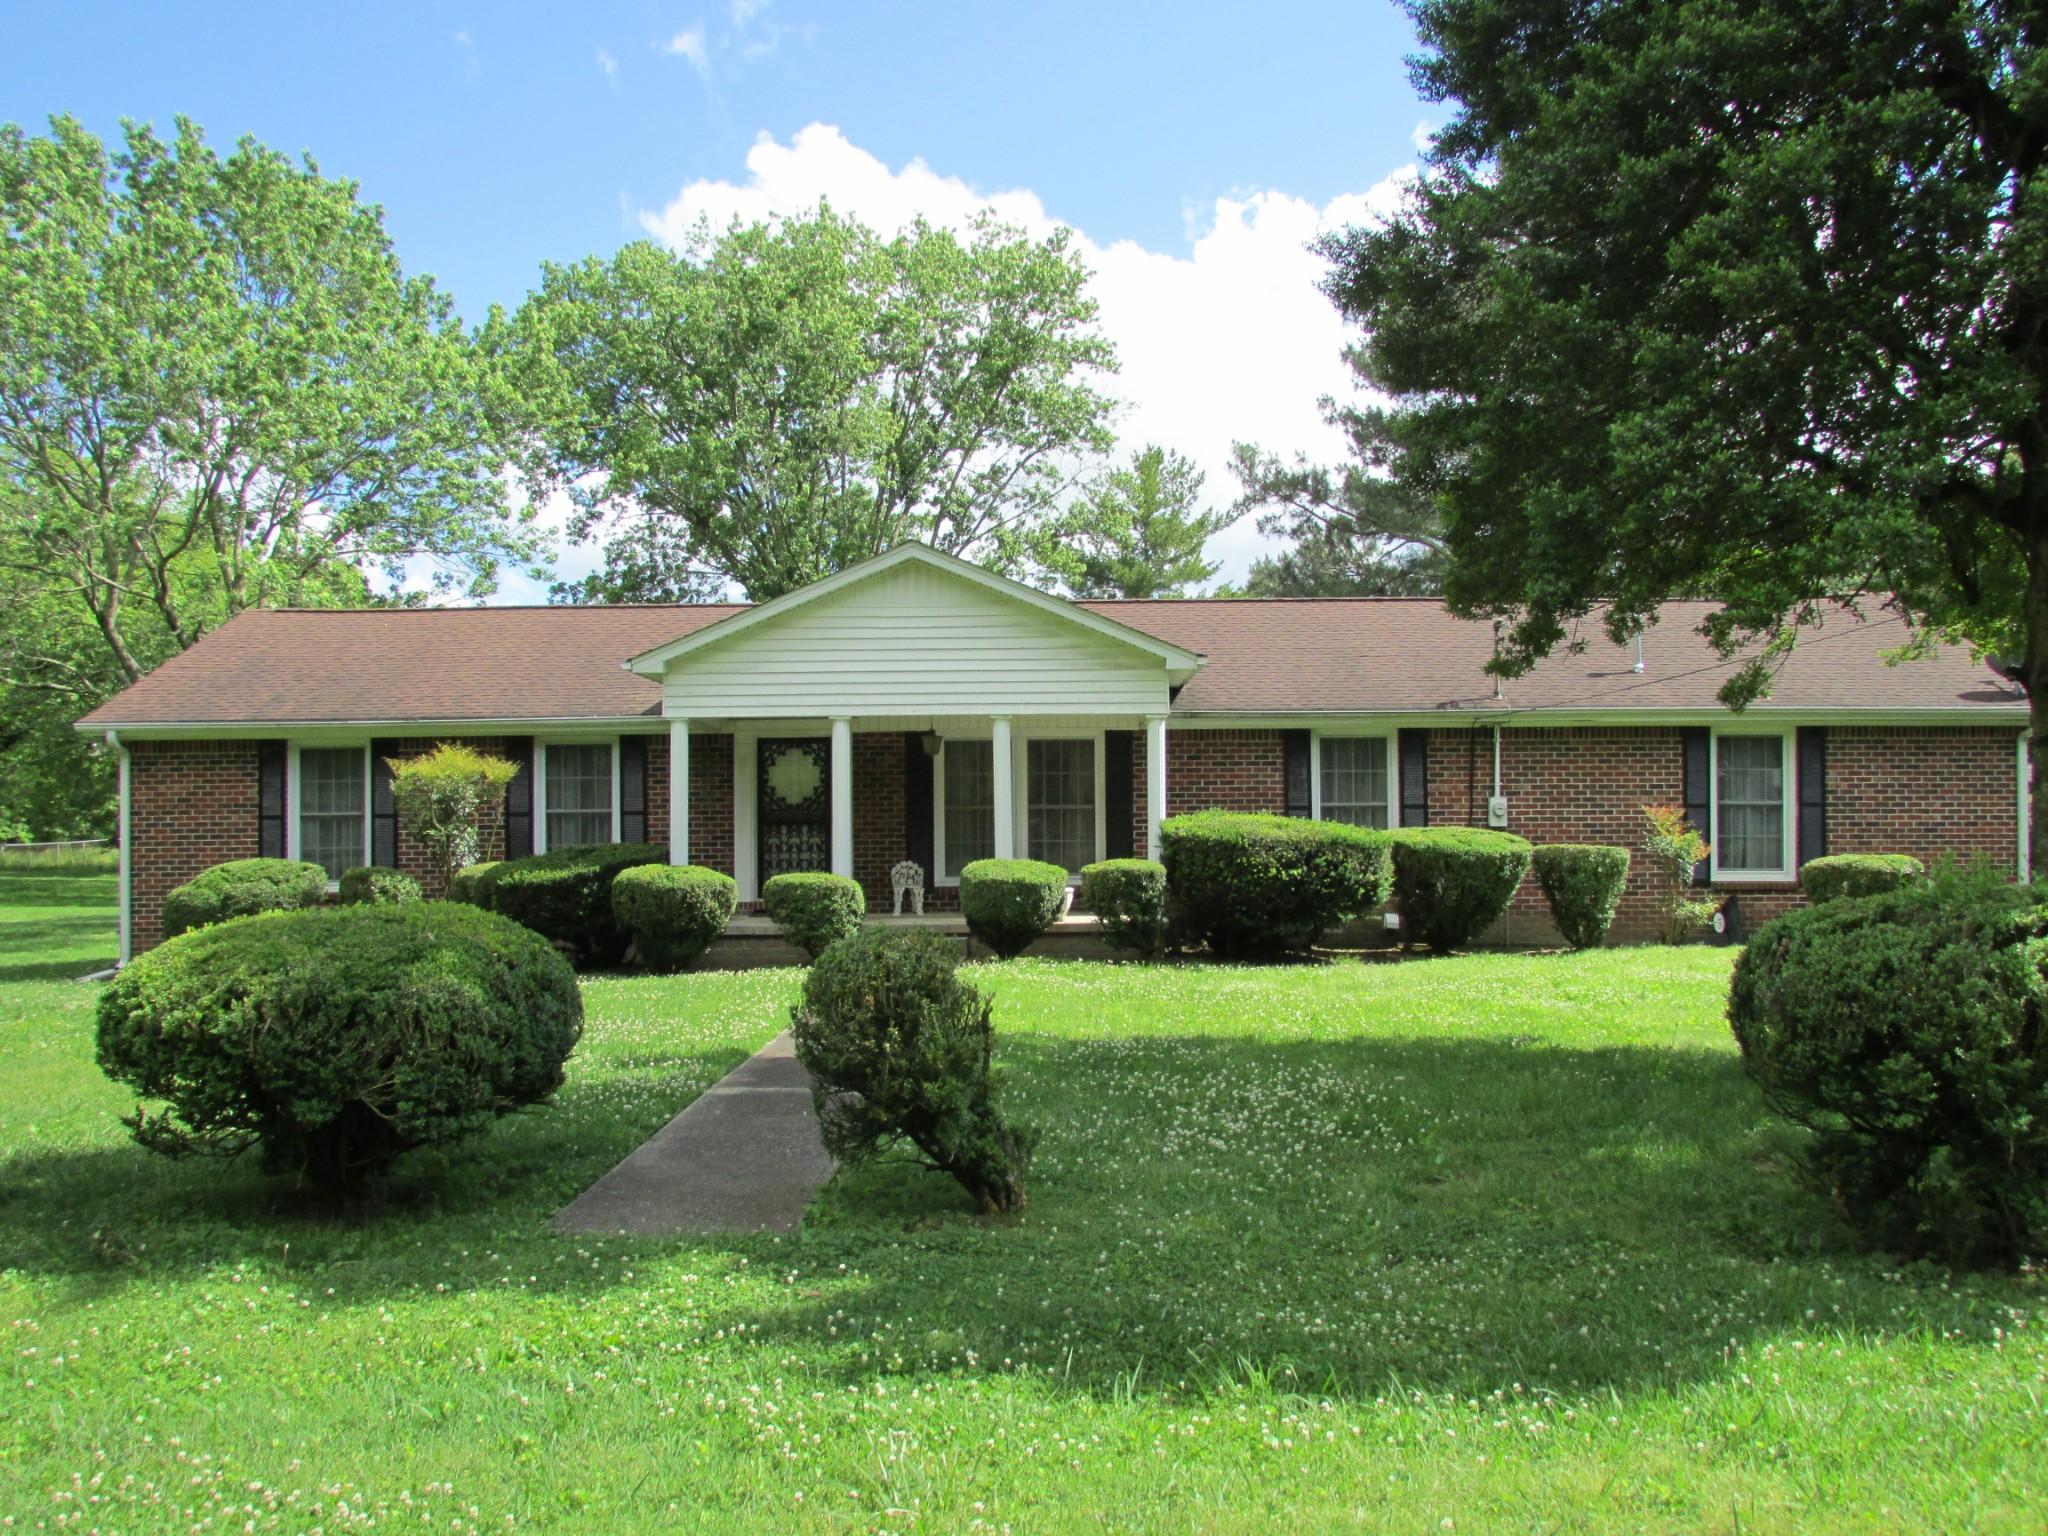 405 Davis Rd Property Photo - Tullahoma, TN real estate listing